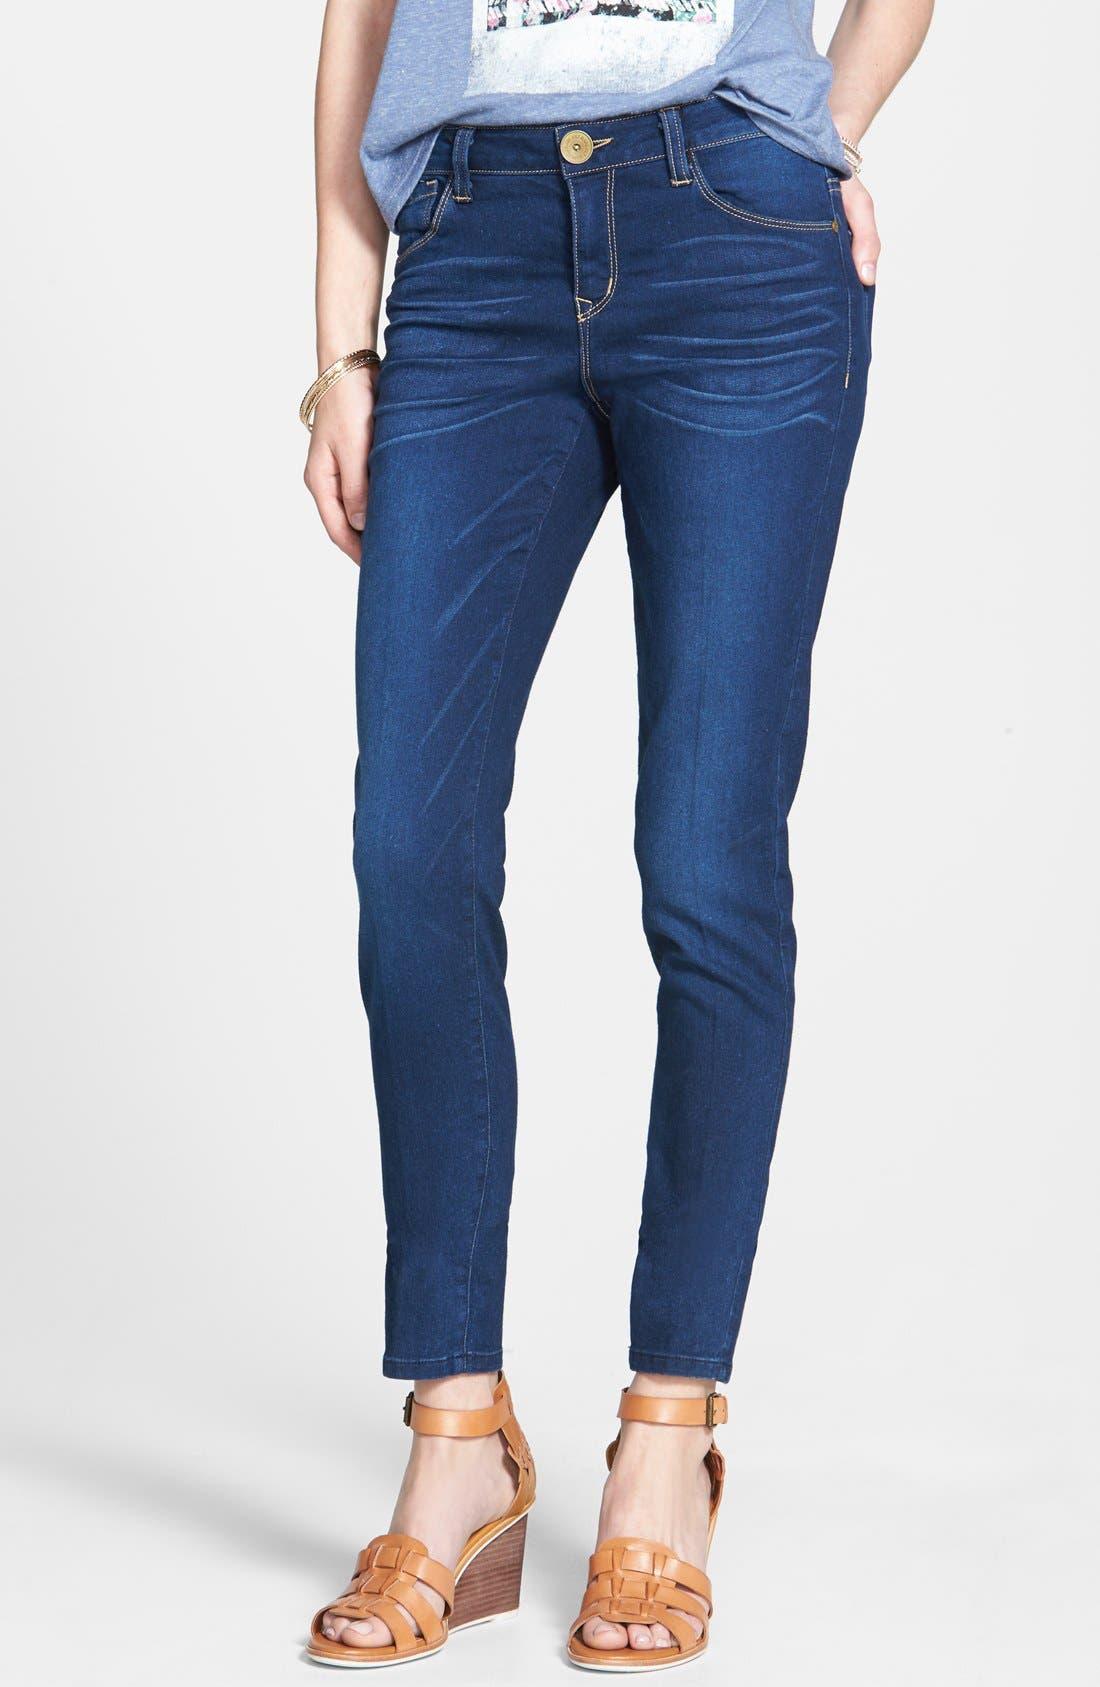 Main Image - Jolt Mid-Rise Skinny Jeans (Dark)